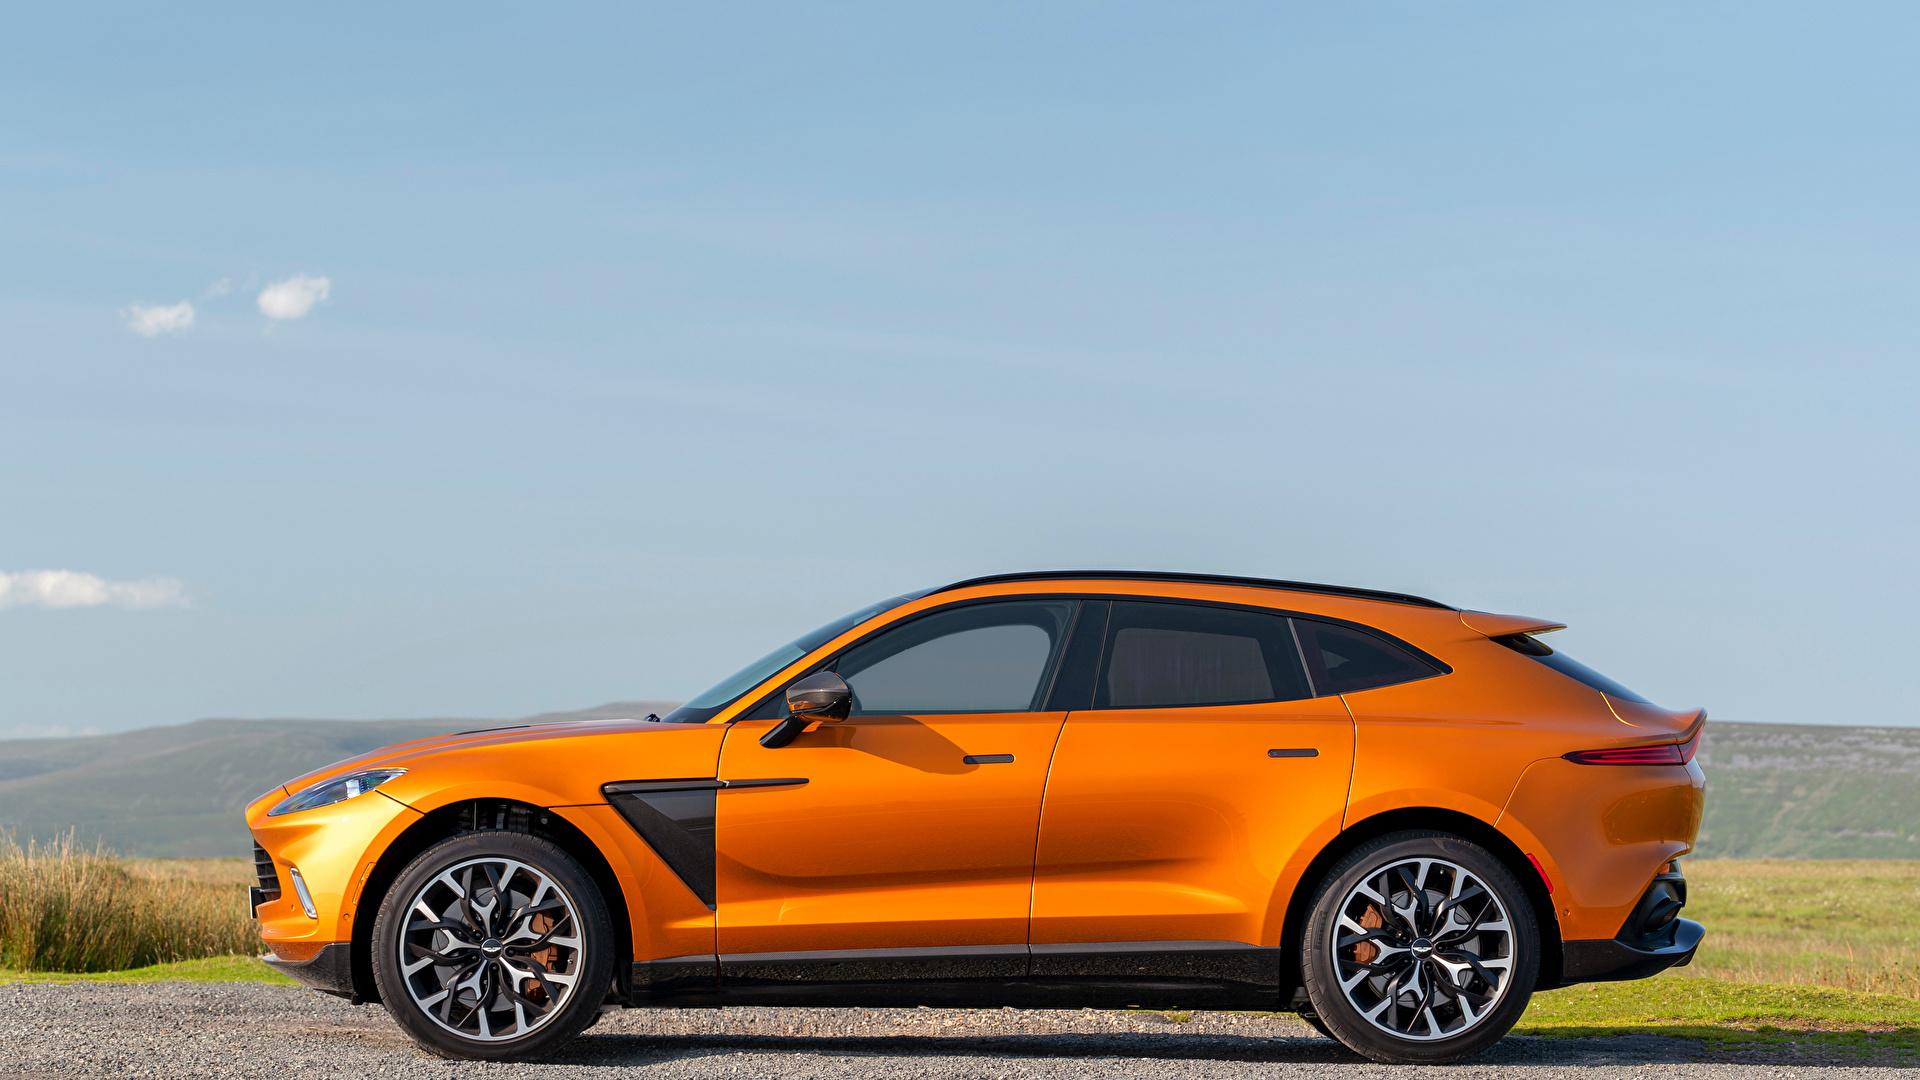 Фотографии Aston Martin Кроссовер DBX, North America, 2020 оранжевая Сбоку Металлик Автомобили 1920x1080 Астон мартин CUV Оранжевый оранжевые оранжевых авто машины машина автомобиль